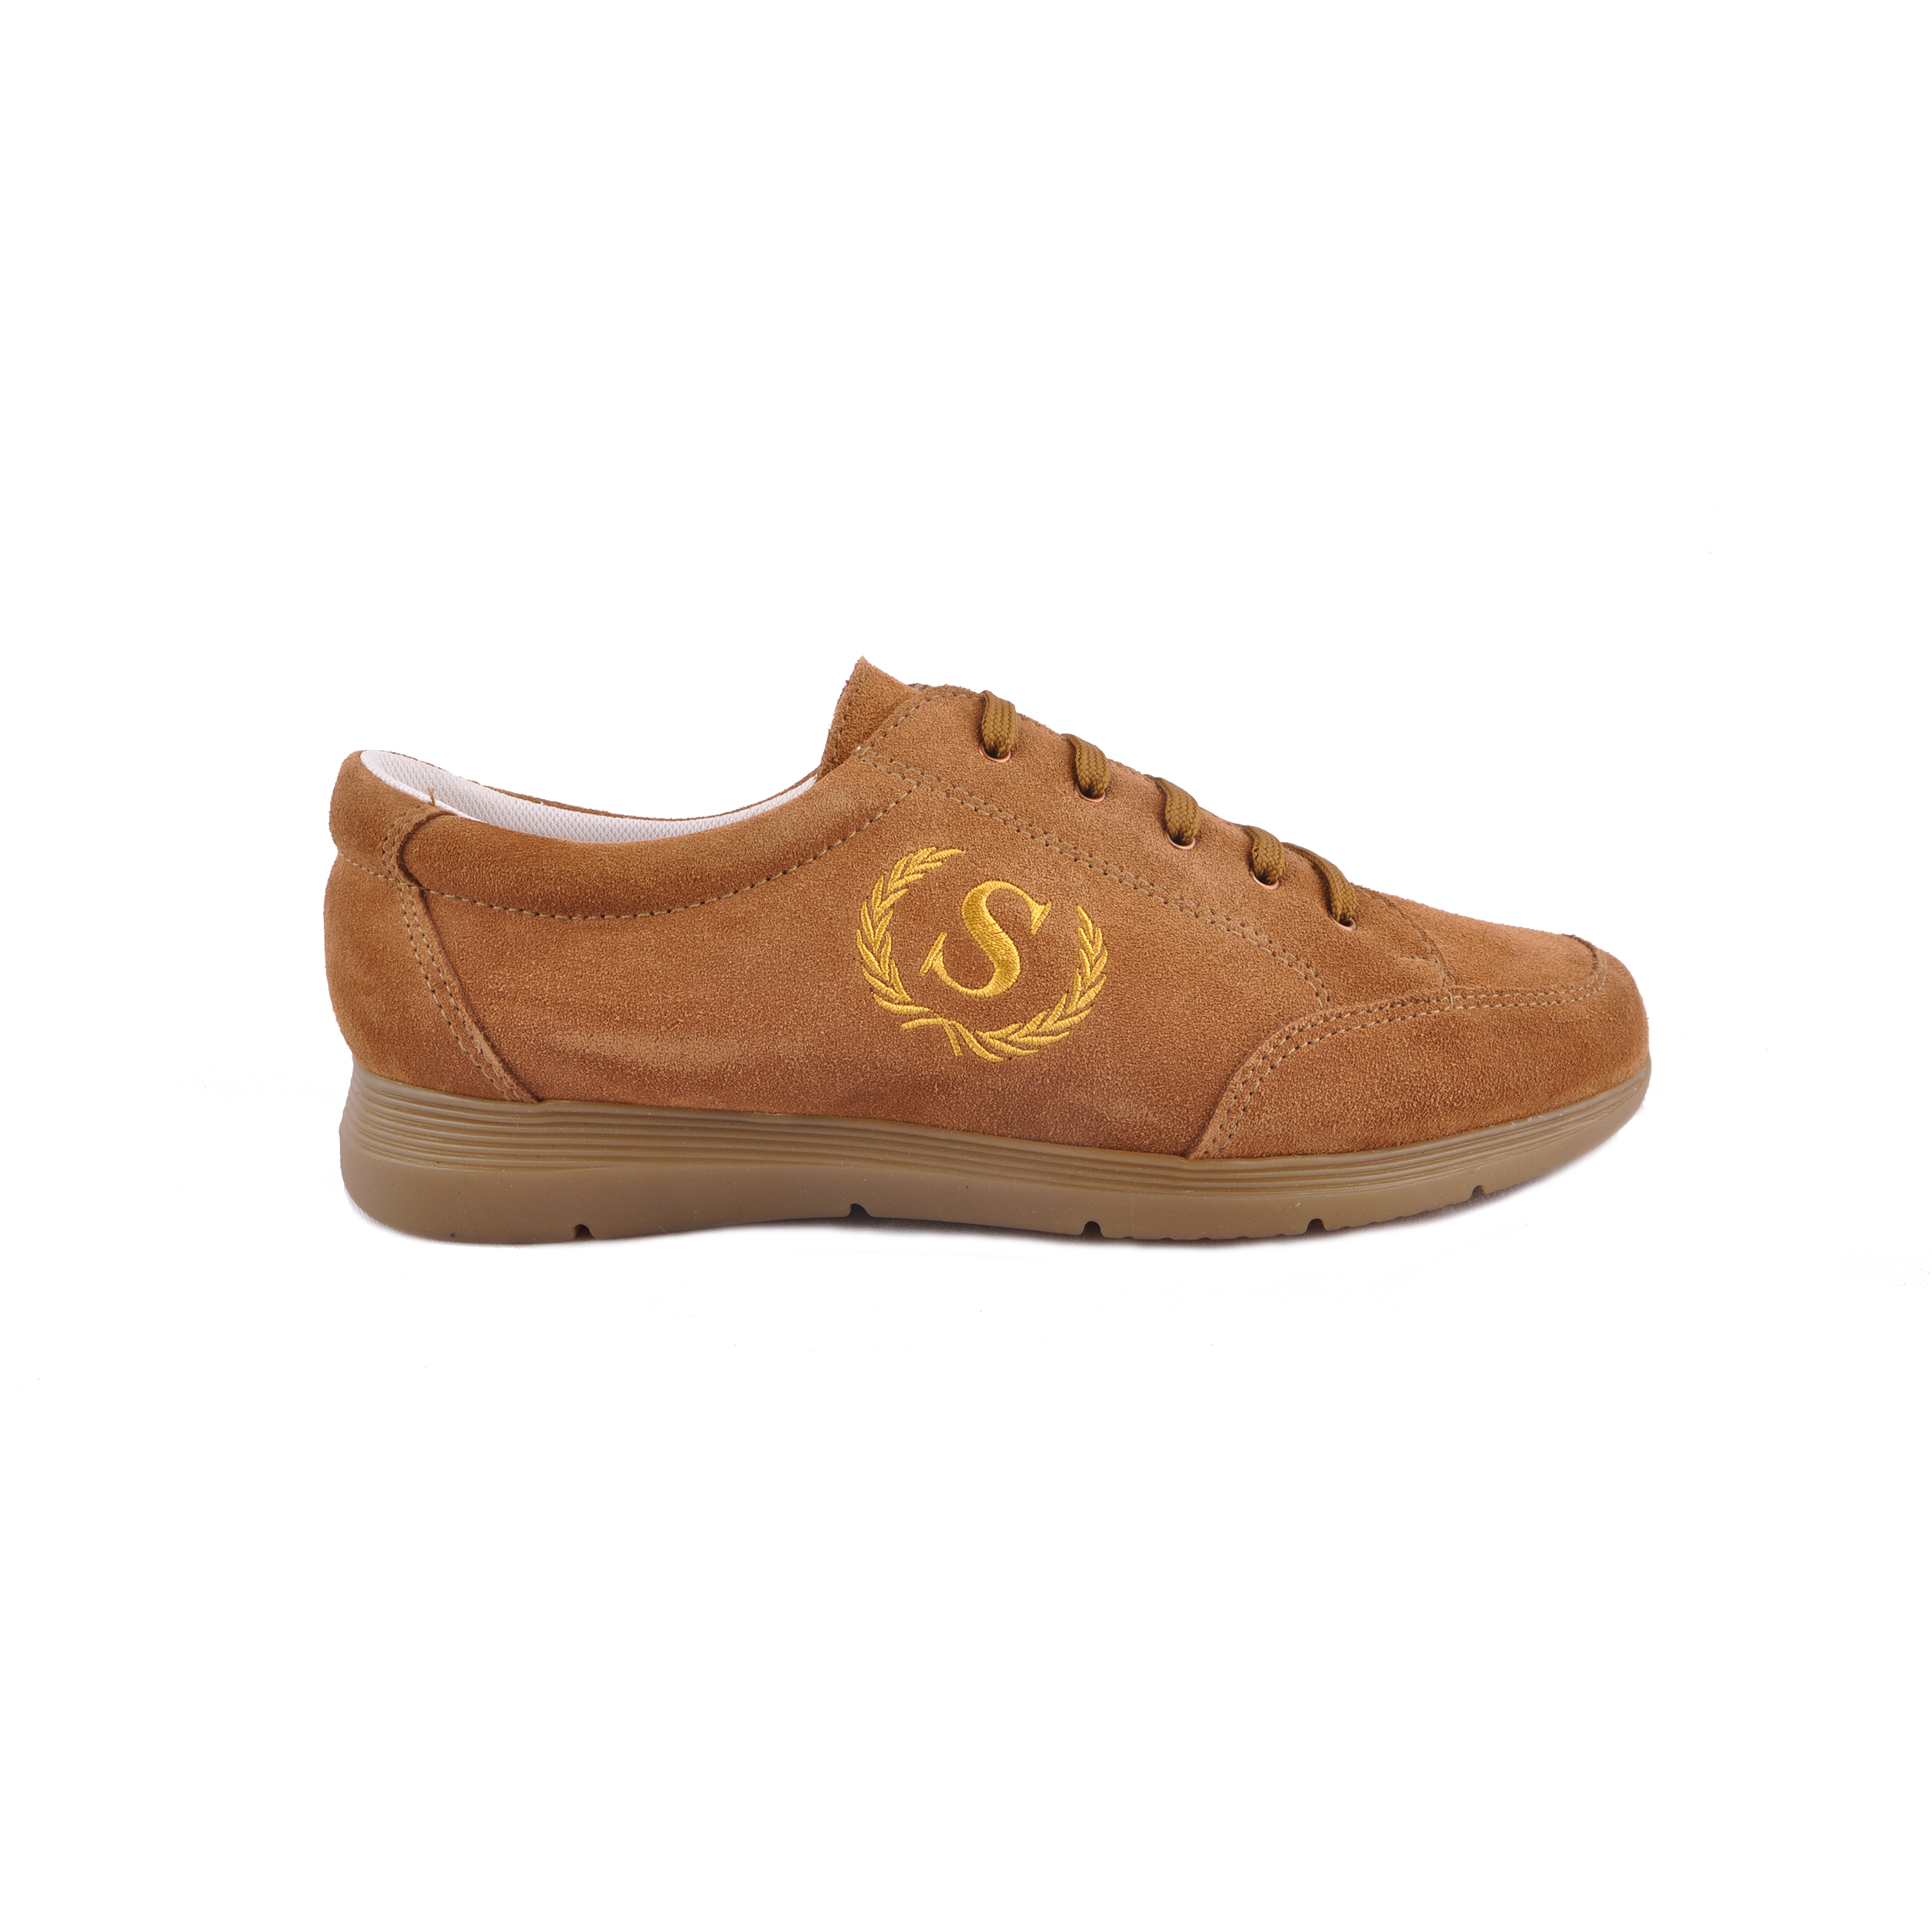 Zapatos Blucher Marrón Sotoalto Hombre Precio Especial rqAgrZ5w